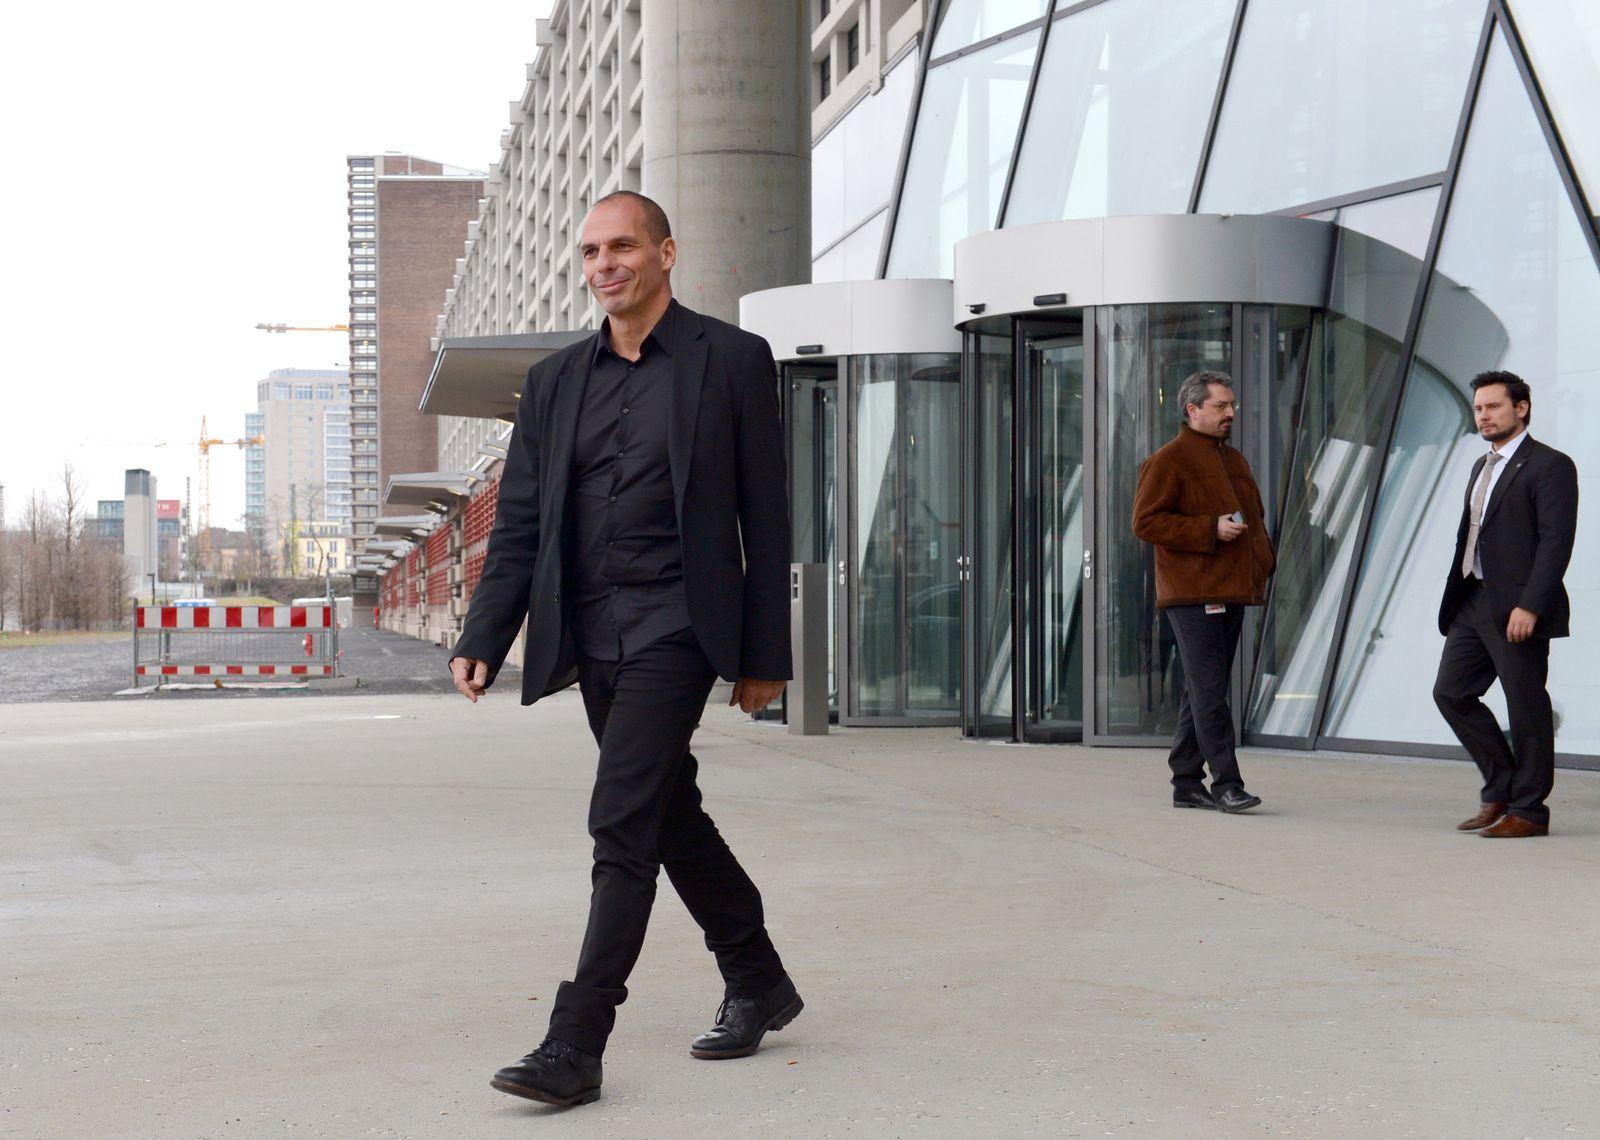 Varoufakis / EZB